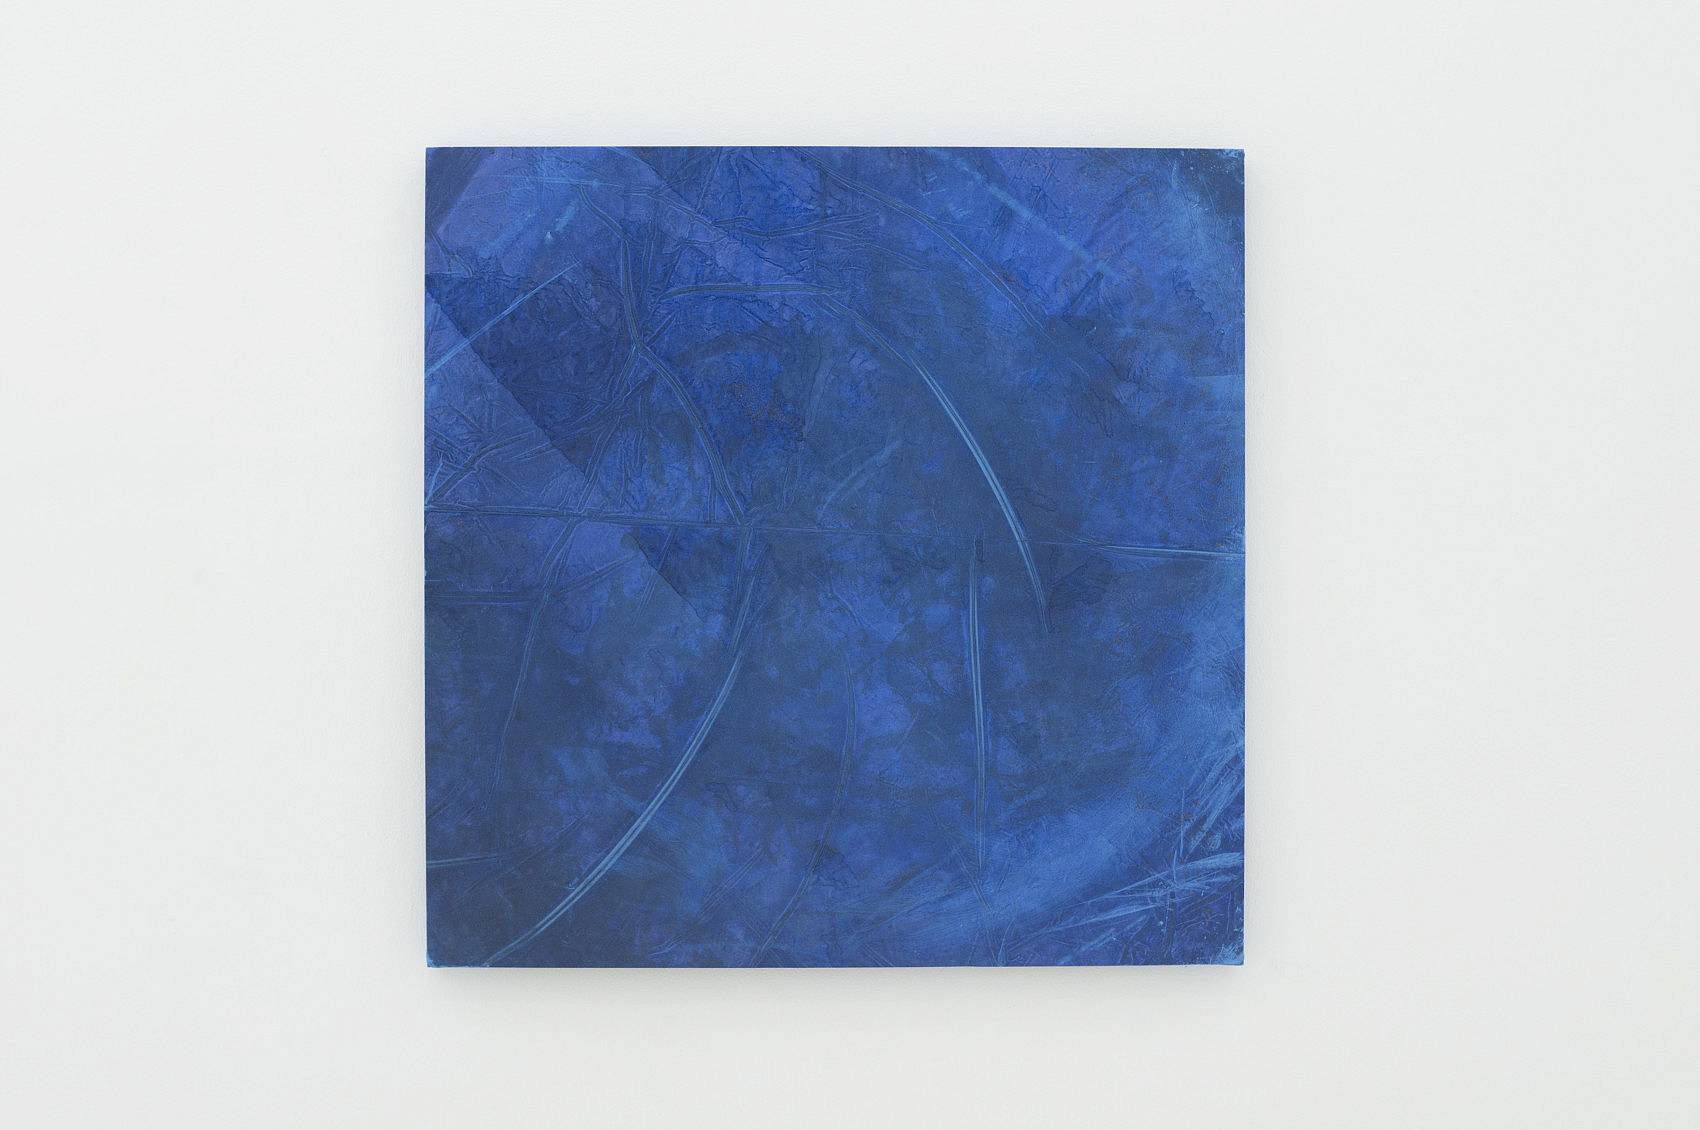 After Bath, latex pool bottom, blue and black ink deposit, 95 x 95 cm, 2016